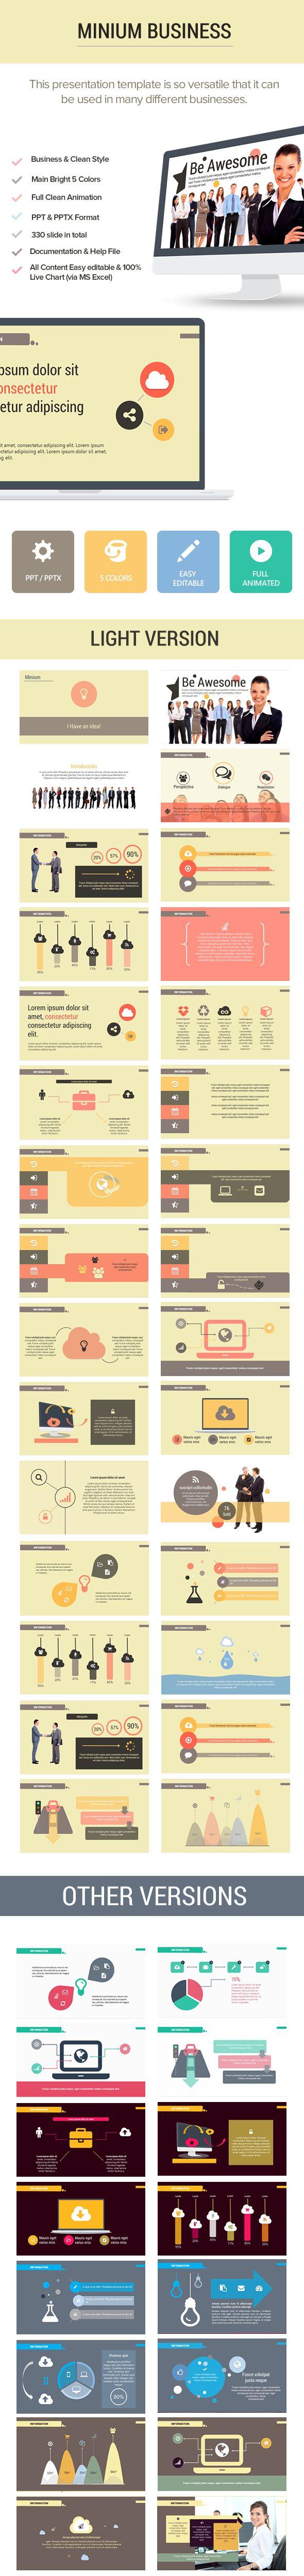 25 best work powerpoint blog templates images on pinterest minium business business powerpoint templatesppt templatepresentation toneelgroepblik Choice Image